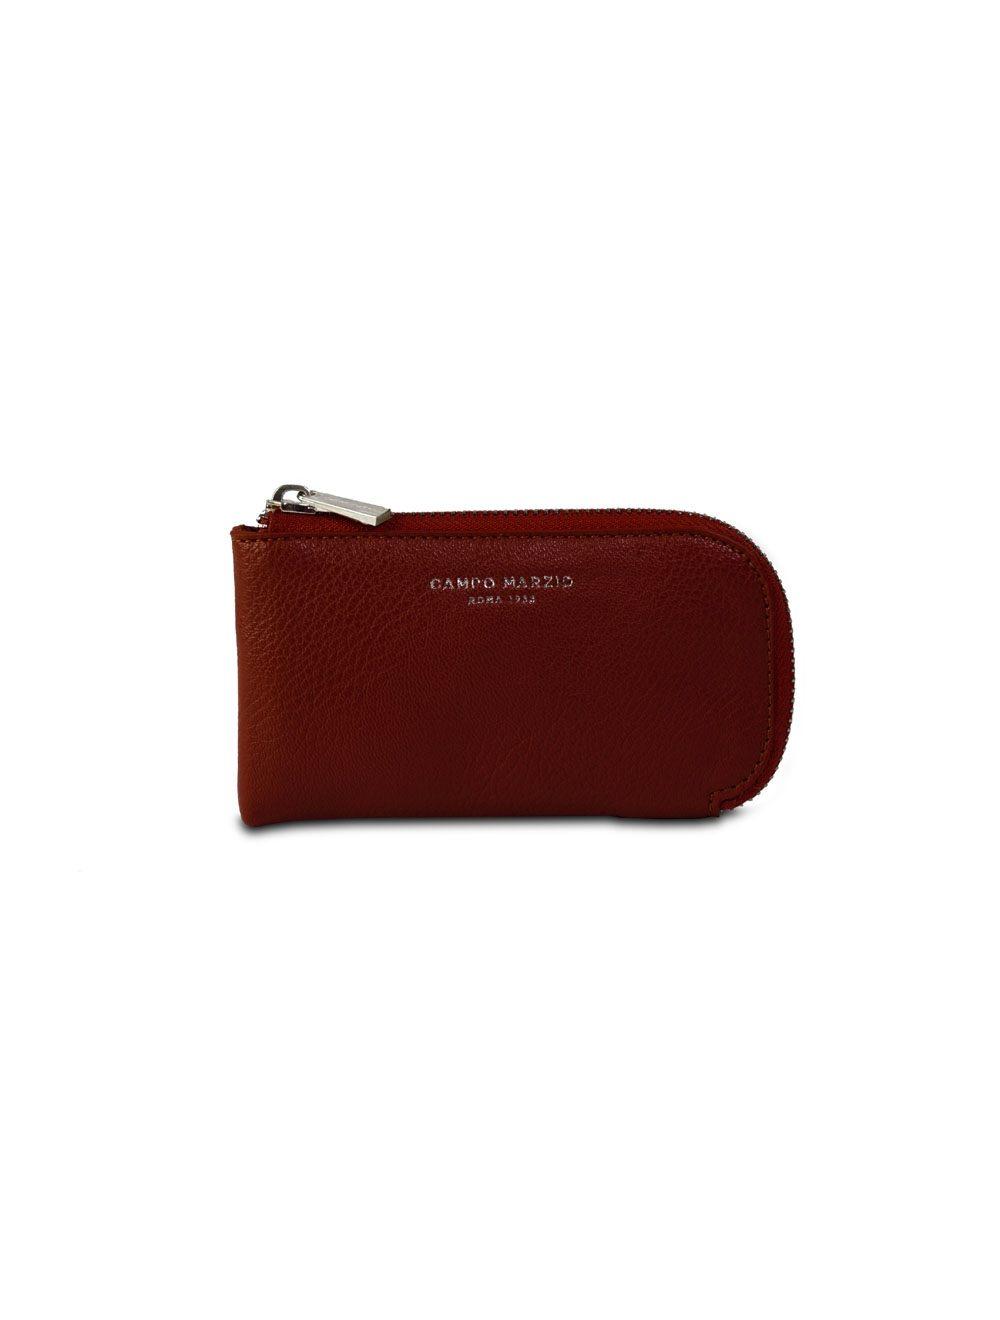 Egon Key Holder - Currant Red